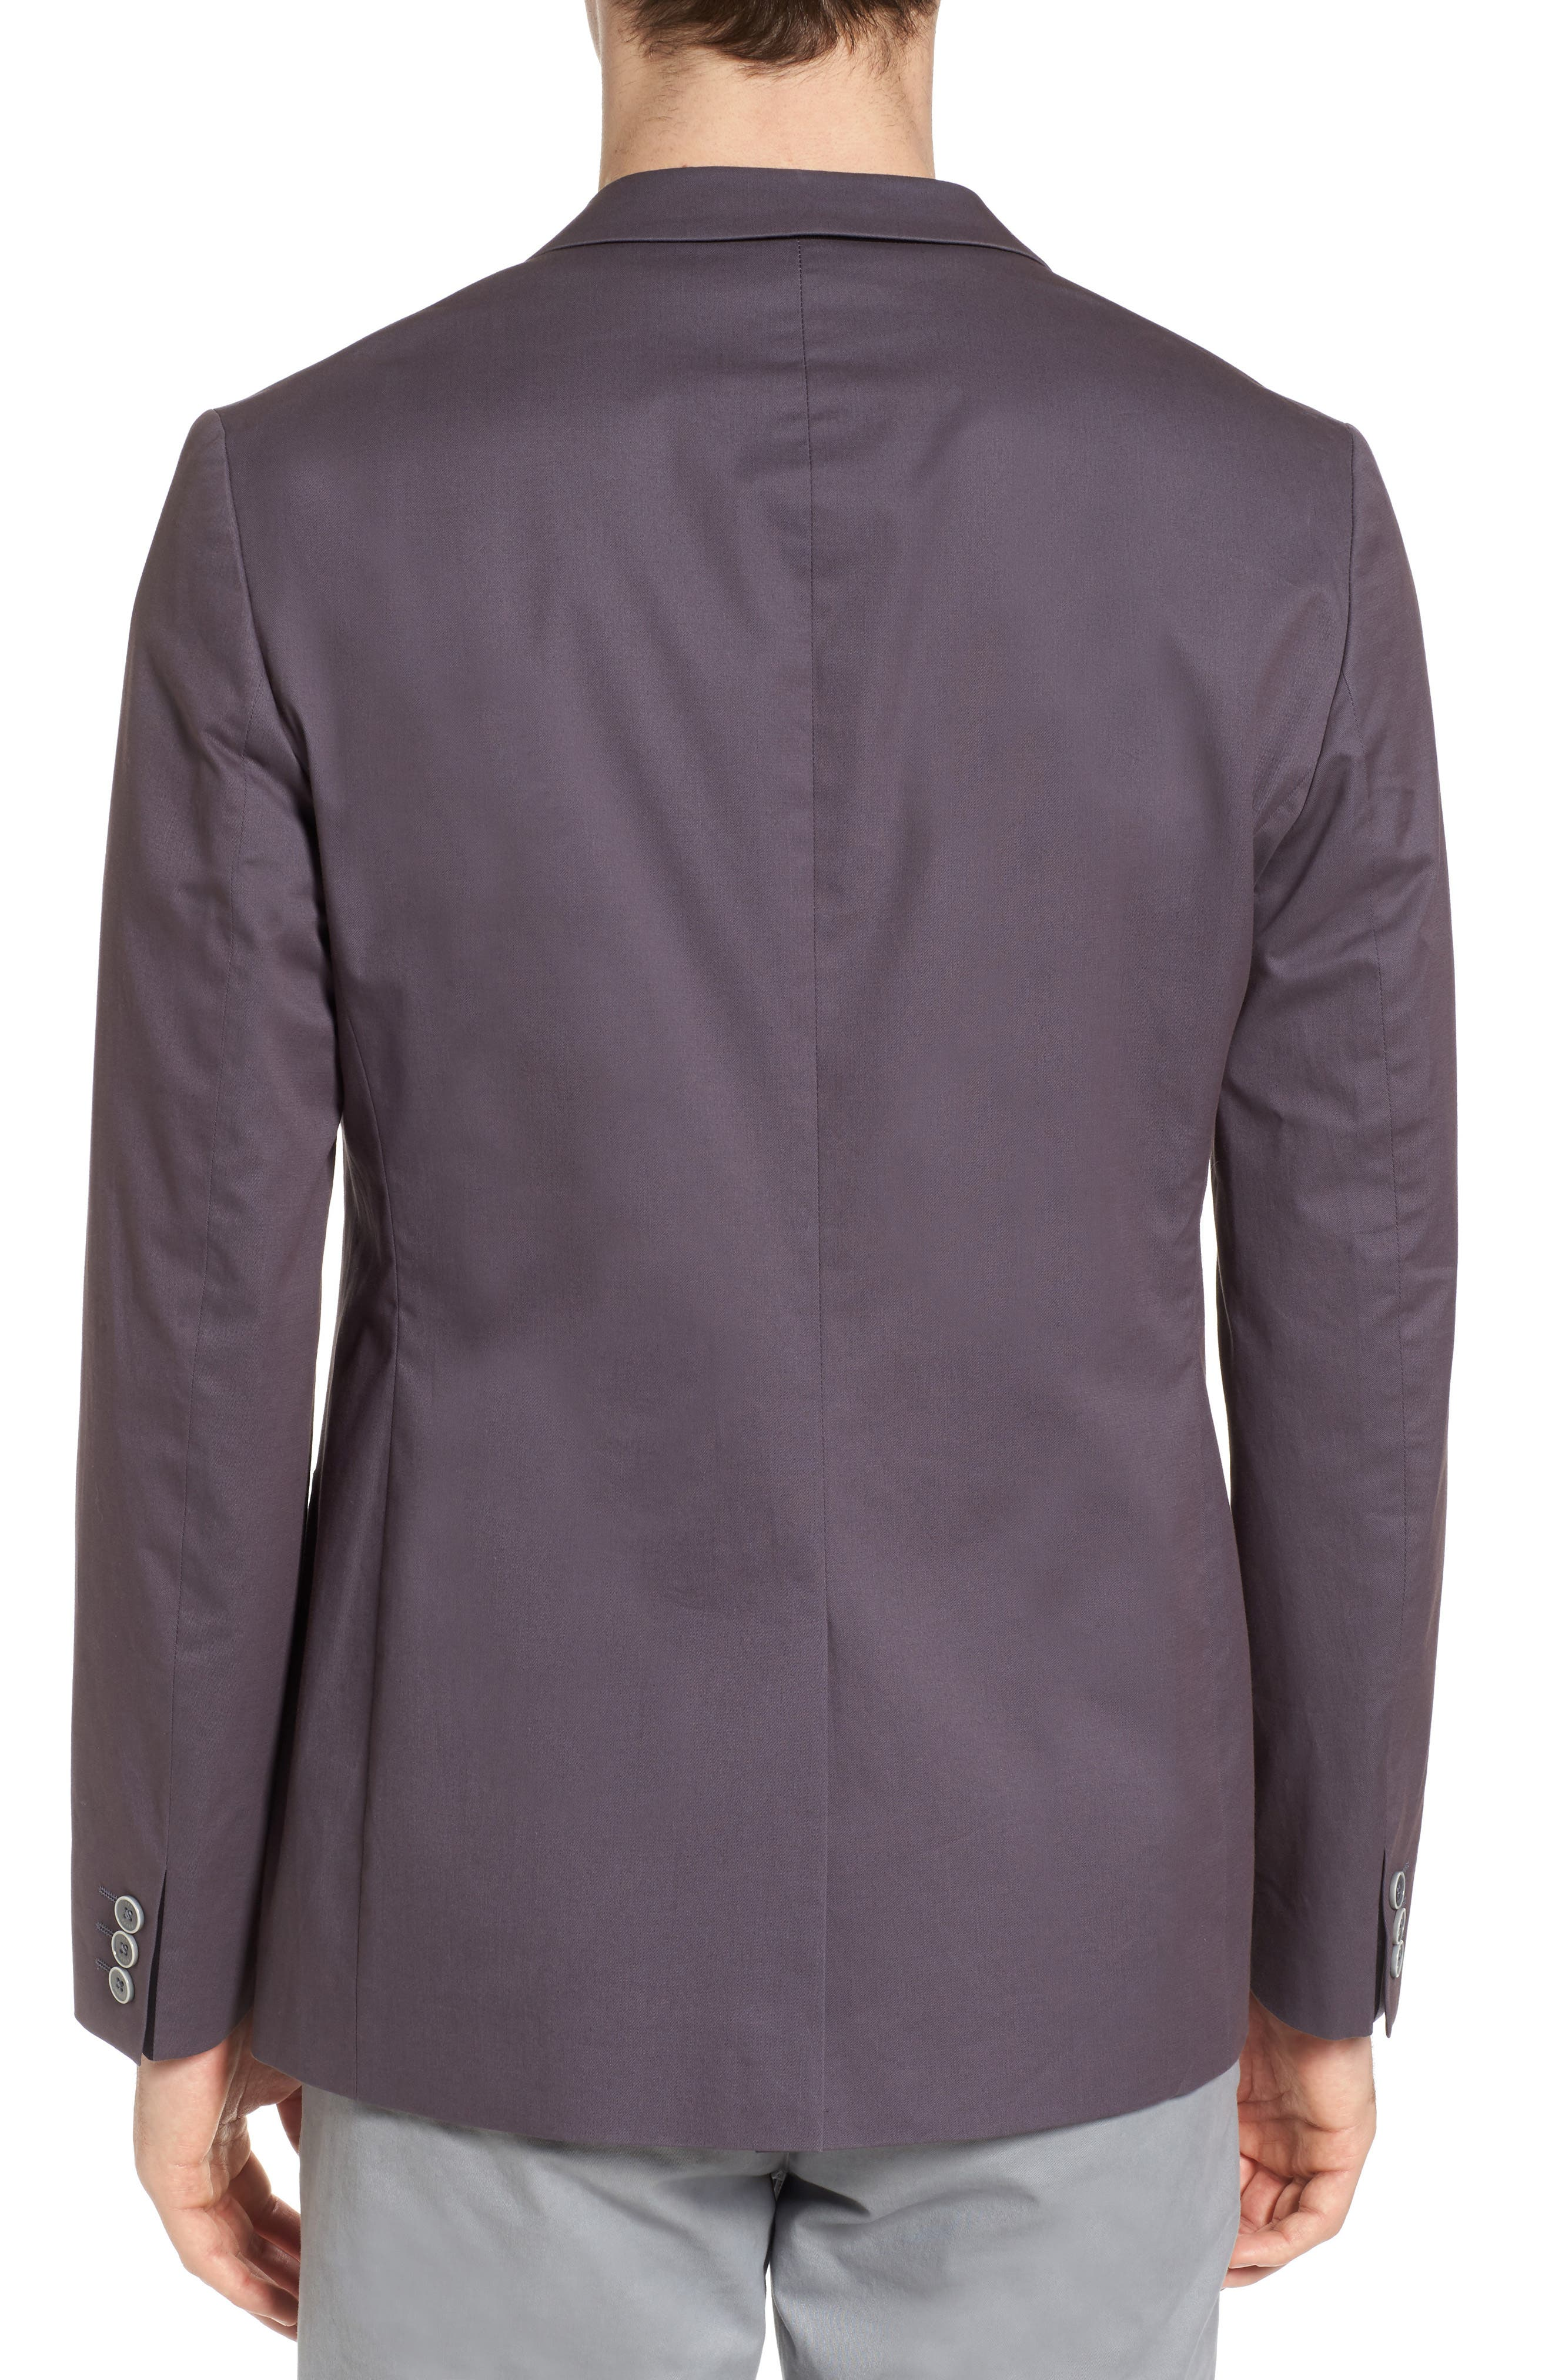 Cliford Trim Fit Stretch Cotton Blazer,                             Alternate thumbnail 2, color,                             Light Grey